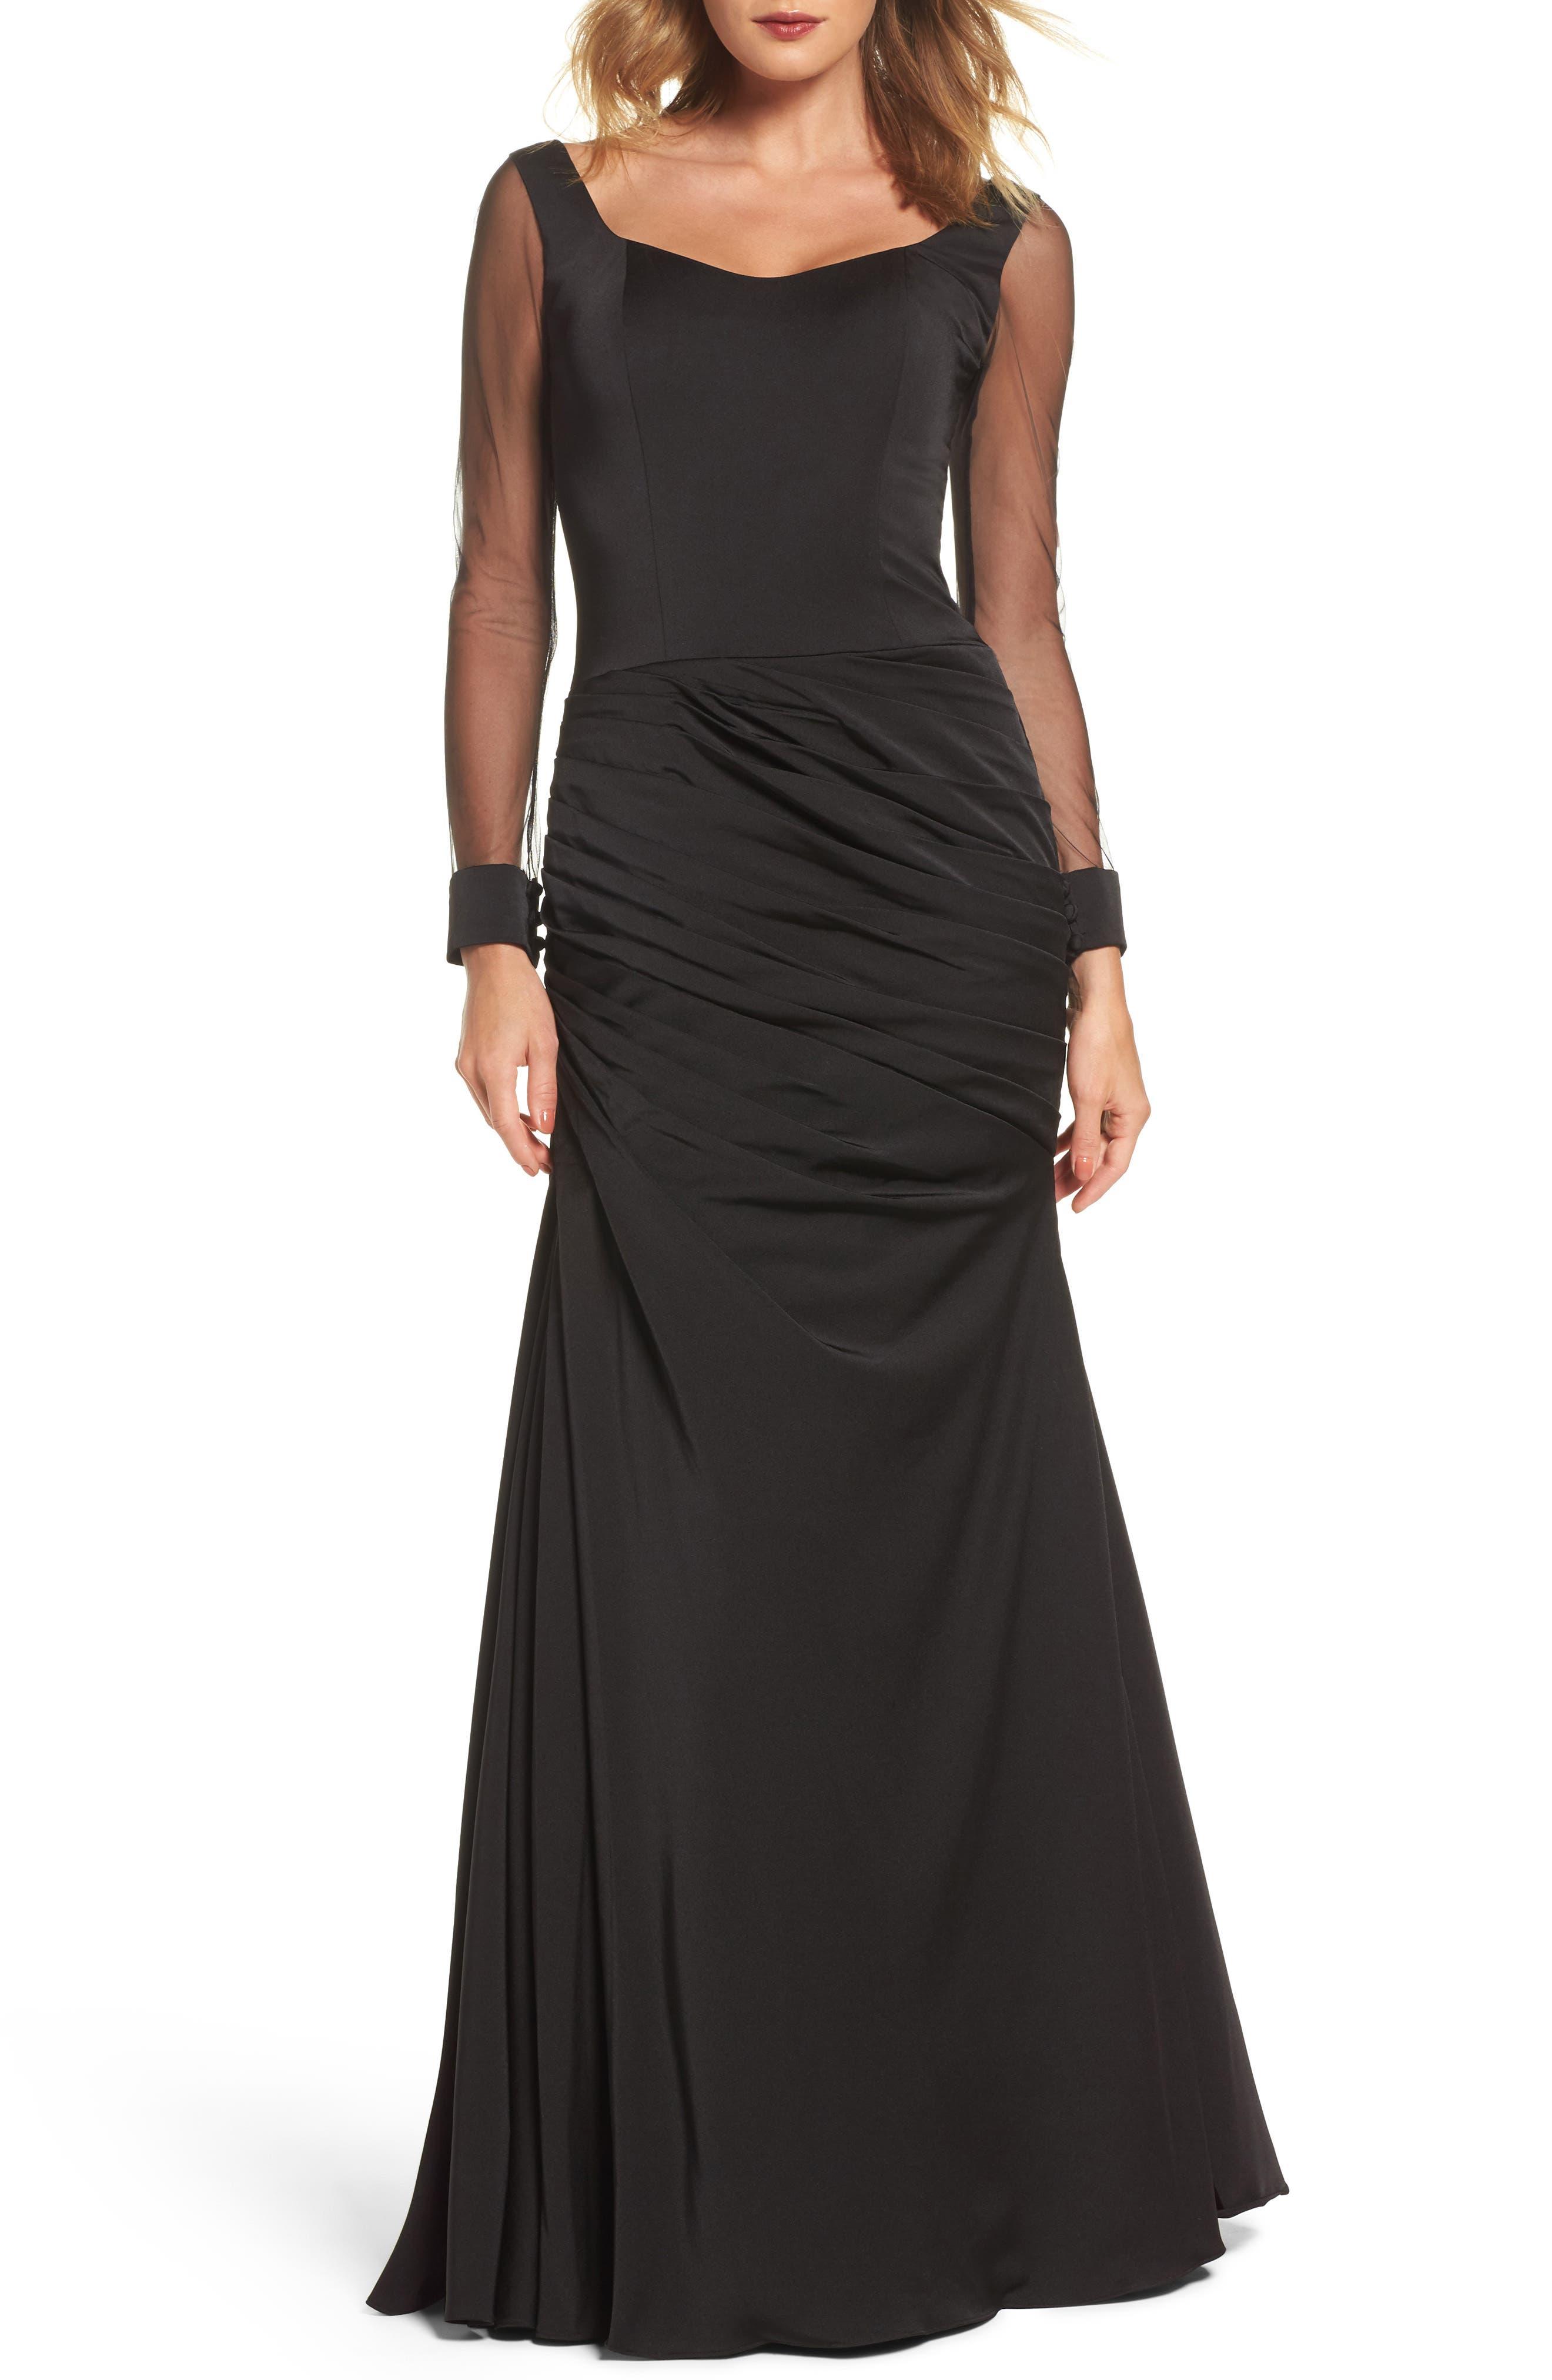 Alternate Image 1 Selected - La Femme Sheer Sleeve Gown